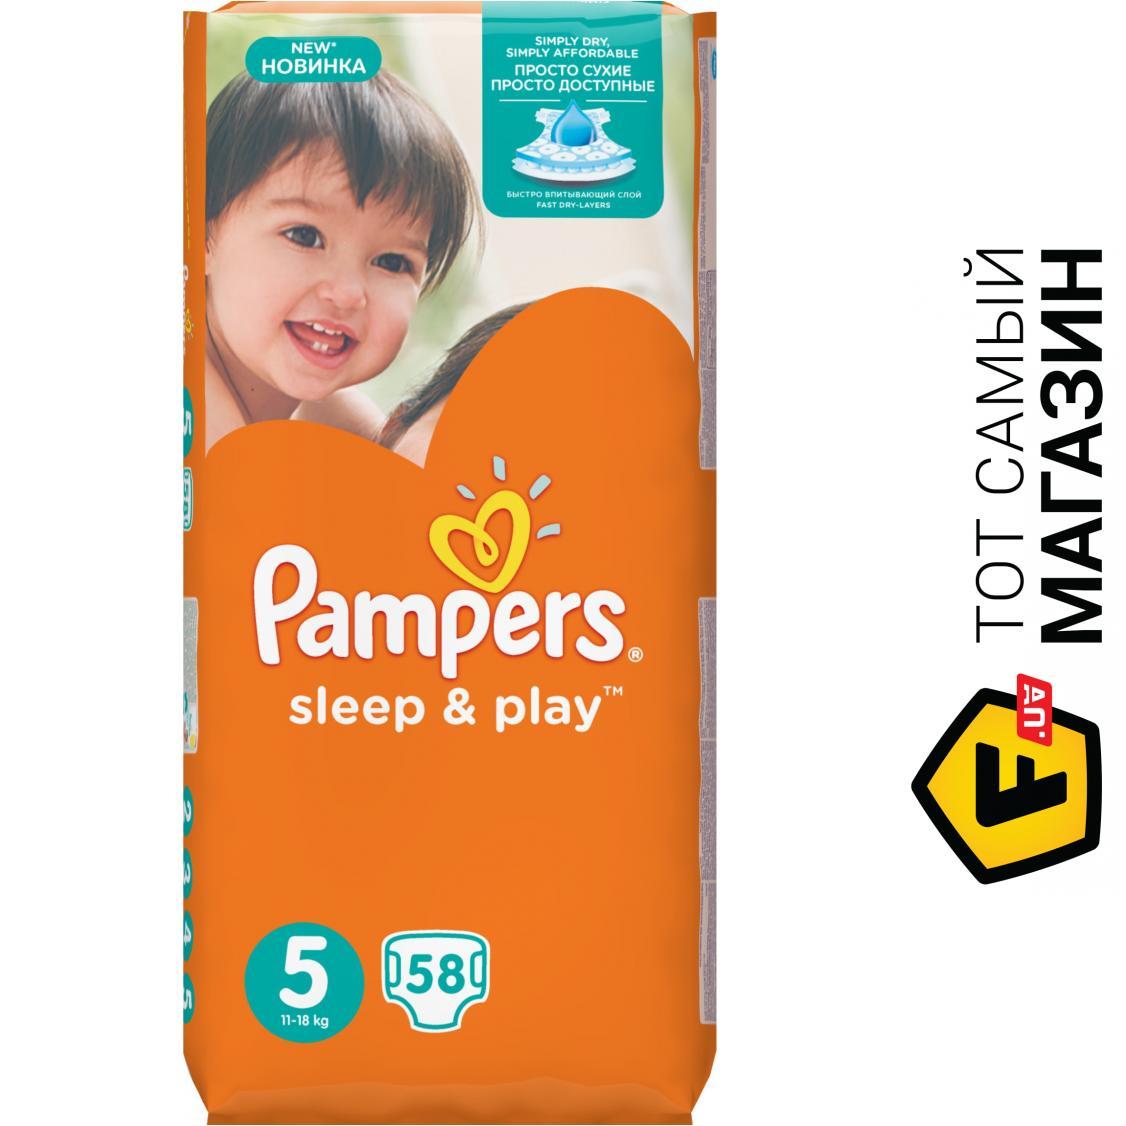 3f9232dce5c7 Подгузники Pampers Sleep   Play Junior 5 11-18кг, 58шт. (4015400203582)